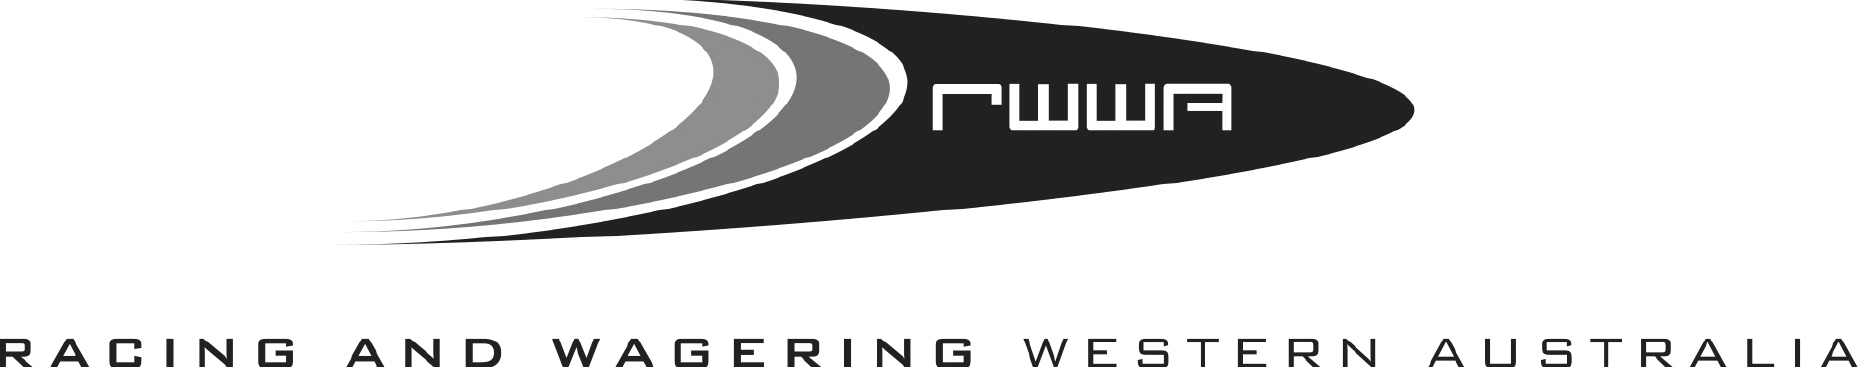 Content Living Logo | Laura Niebel | Webflow Web Designer